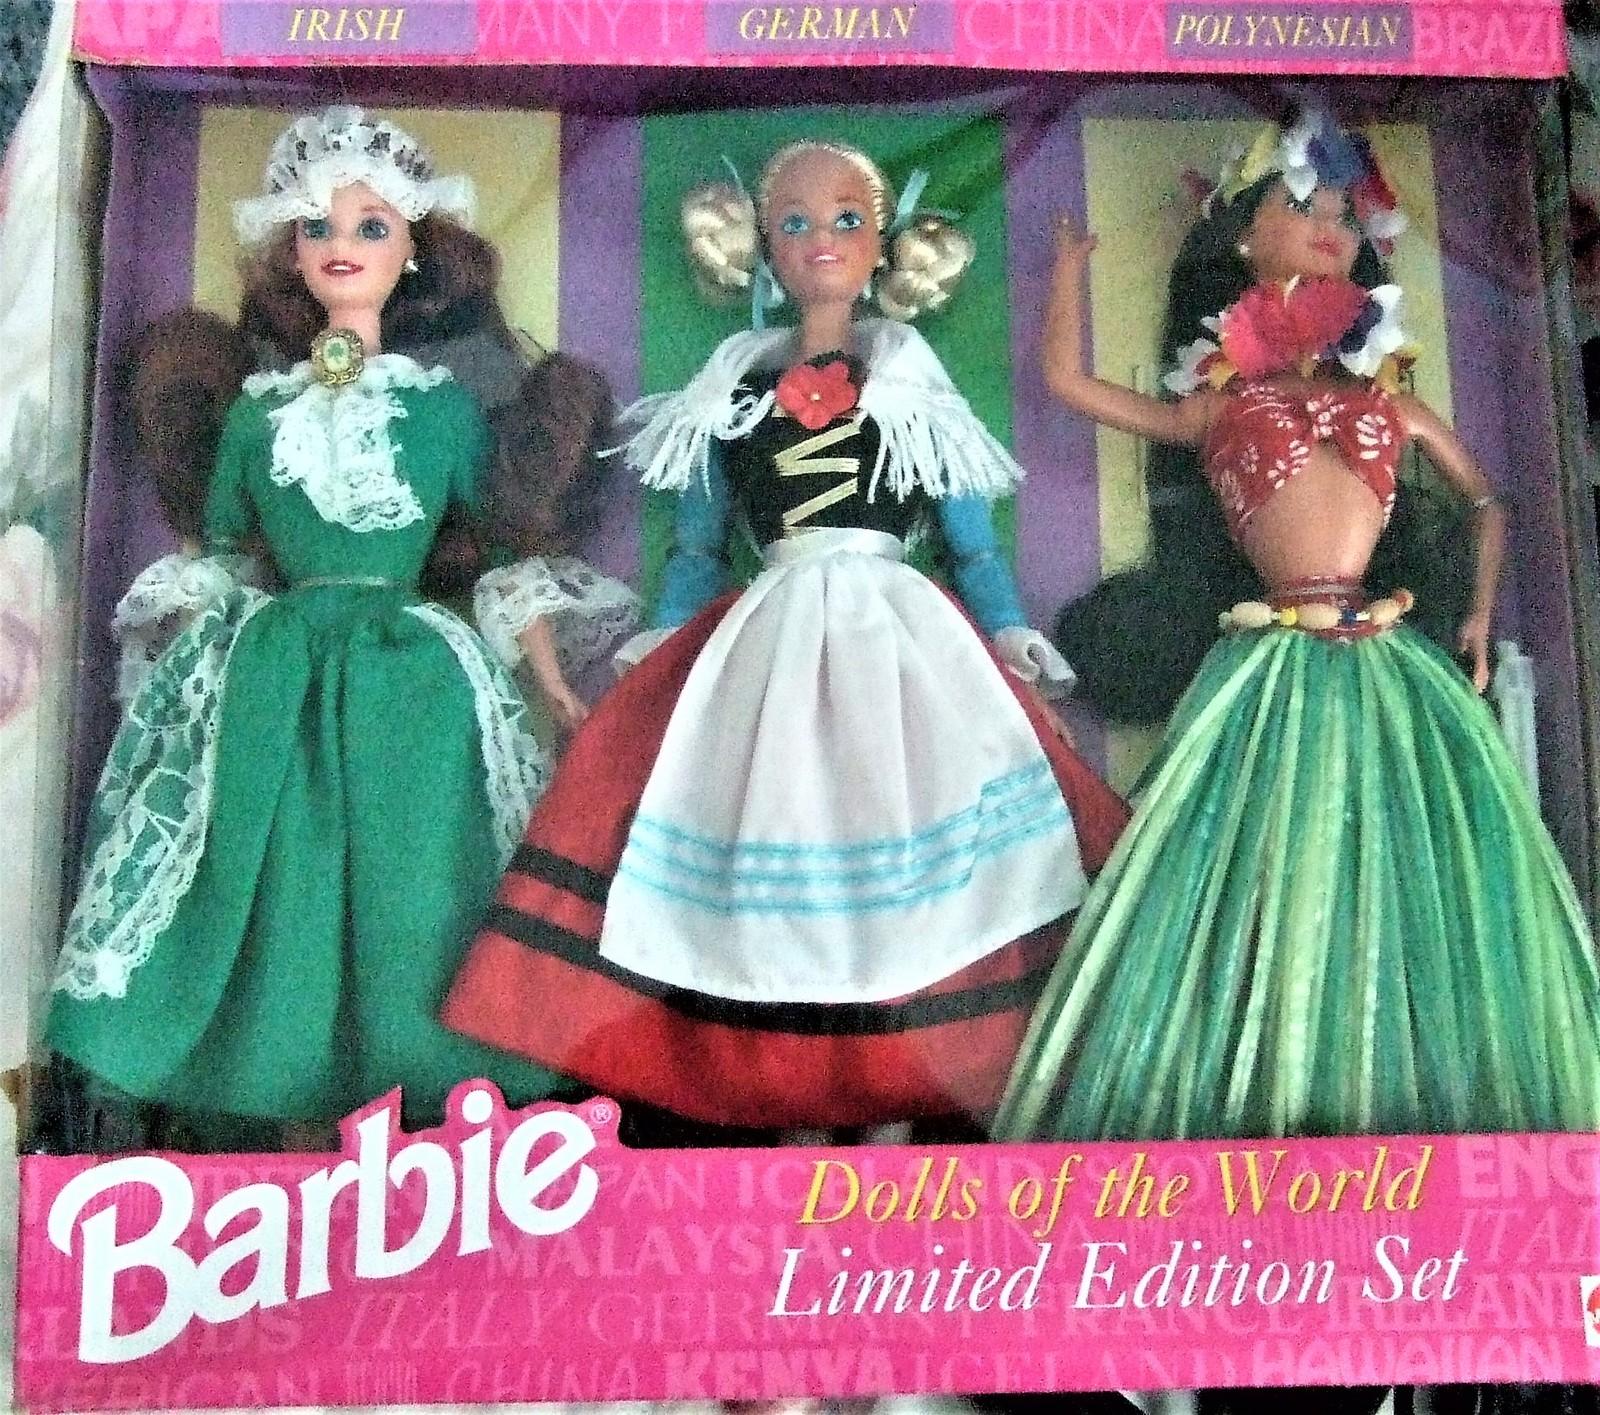 Barbie Dolls - 1994 Dolls of the World Gift Set (3 Dolls) Limited Edition Set